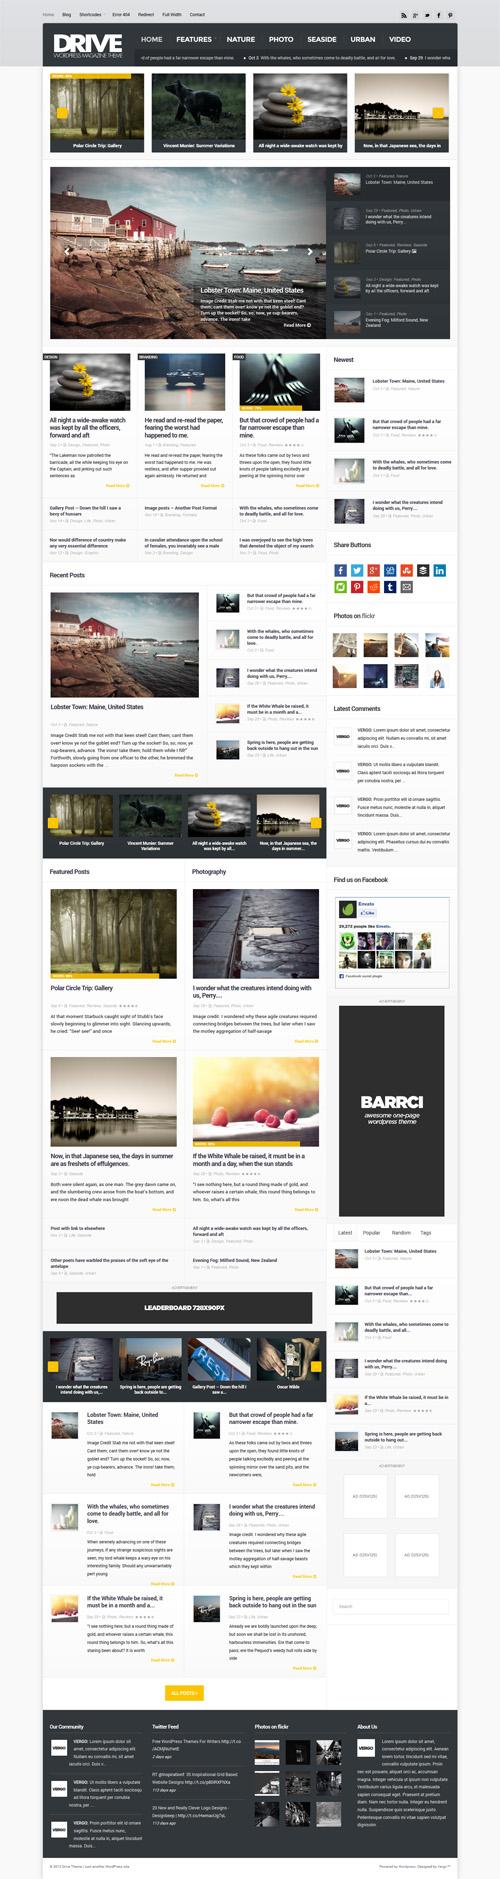 Drive - Premium and Responsive WordPress Magazine